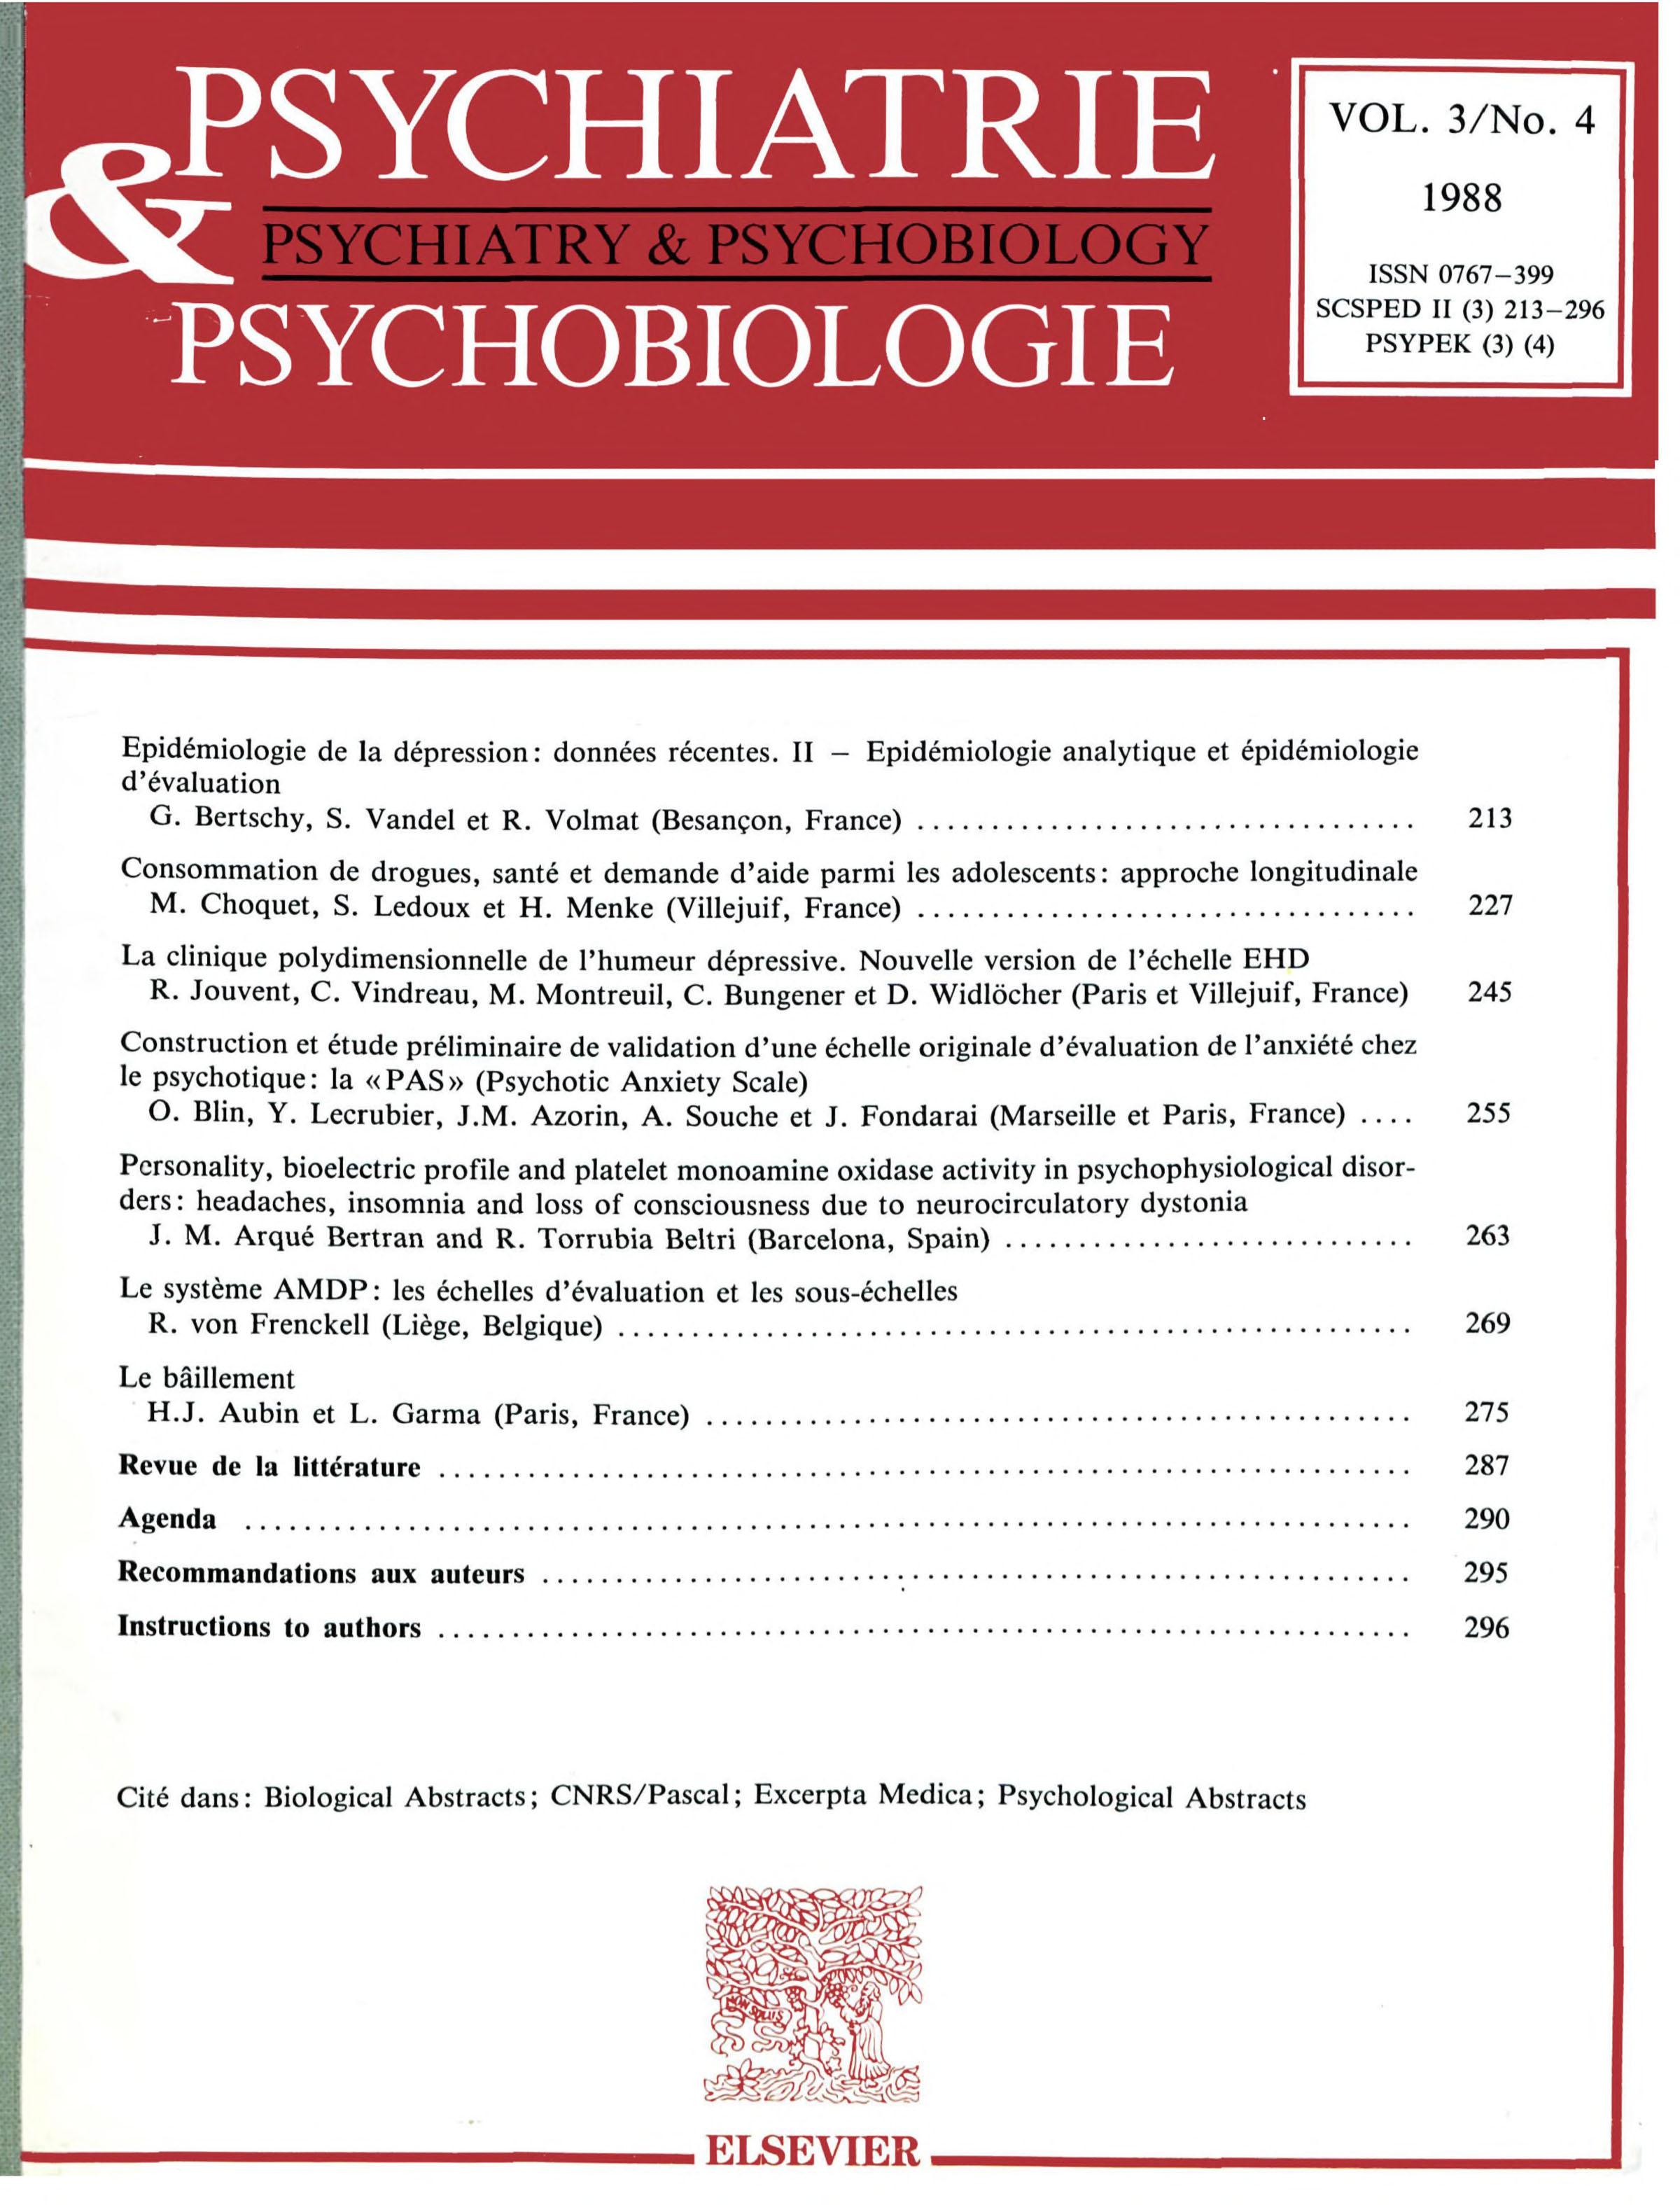 European Psychiatry (Ed. Española)